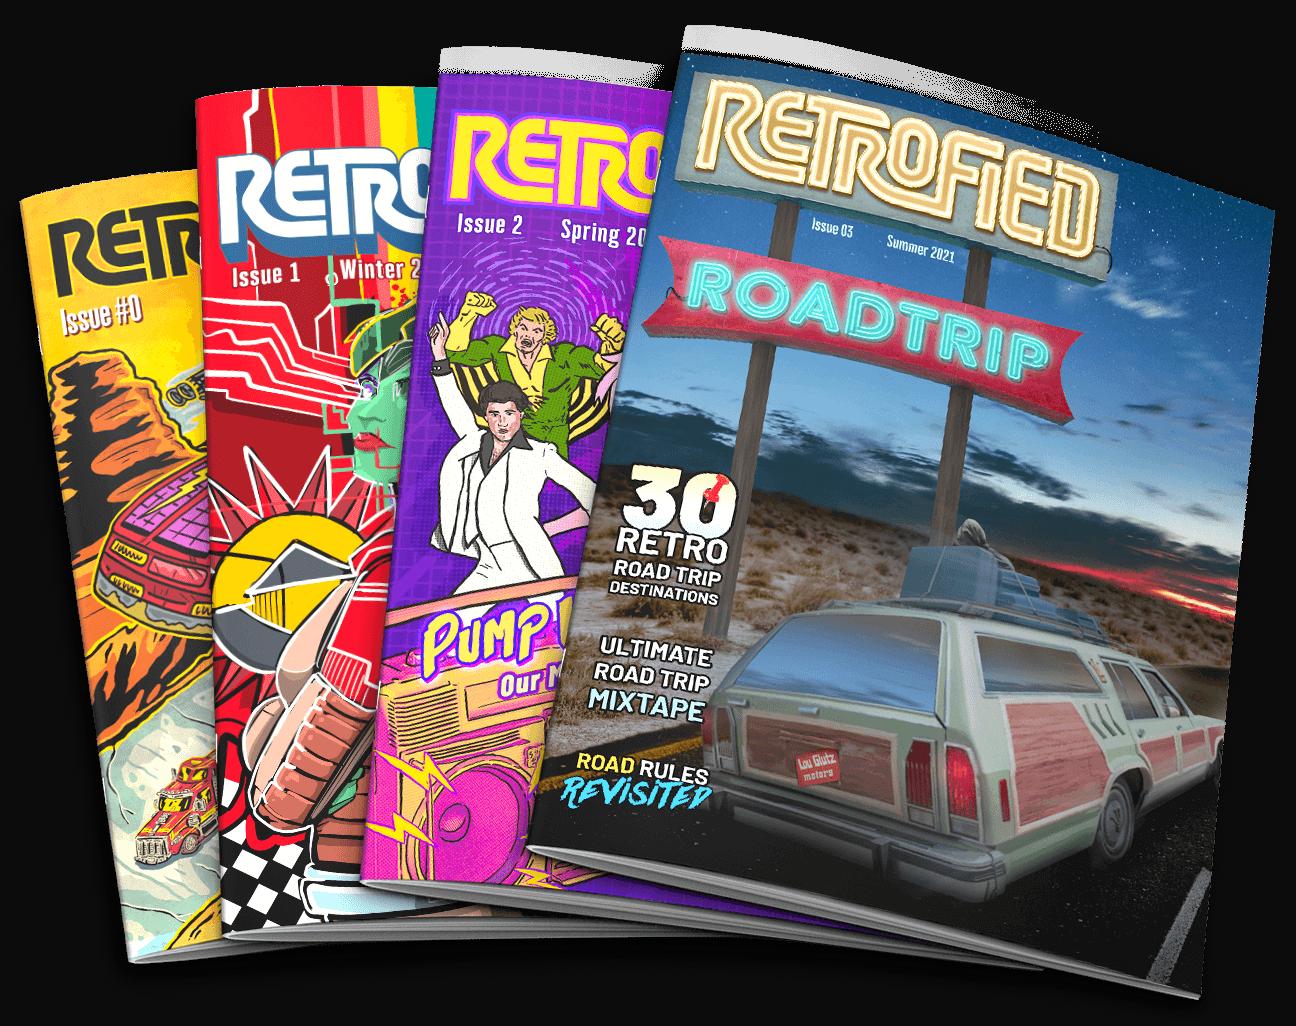 Retrofied Magazine (Retro Magazine)